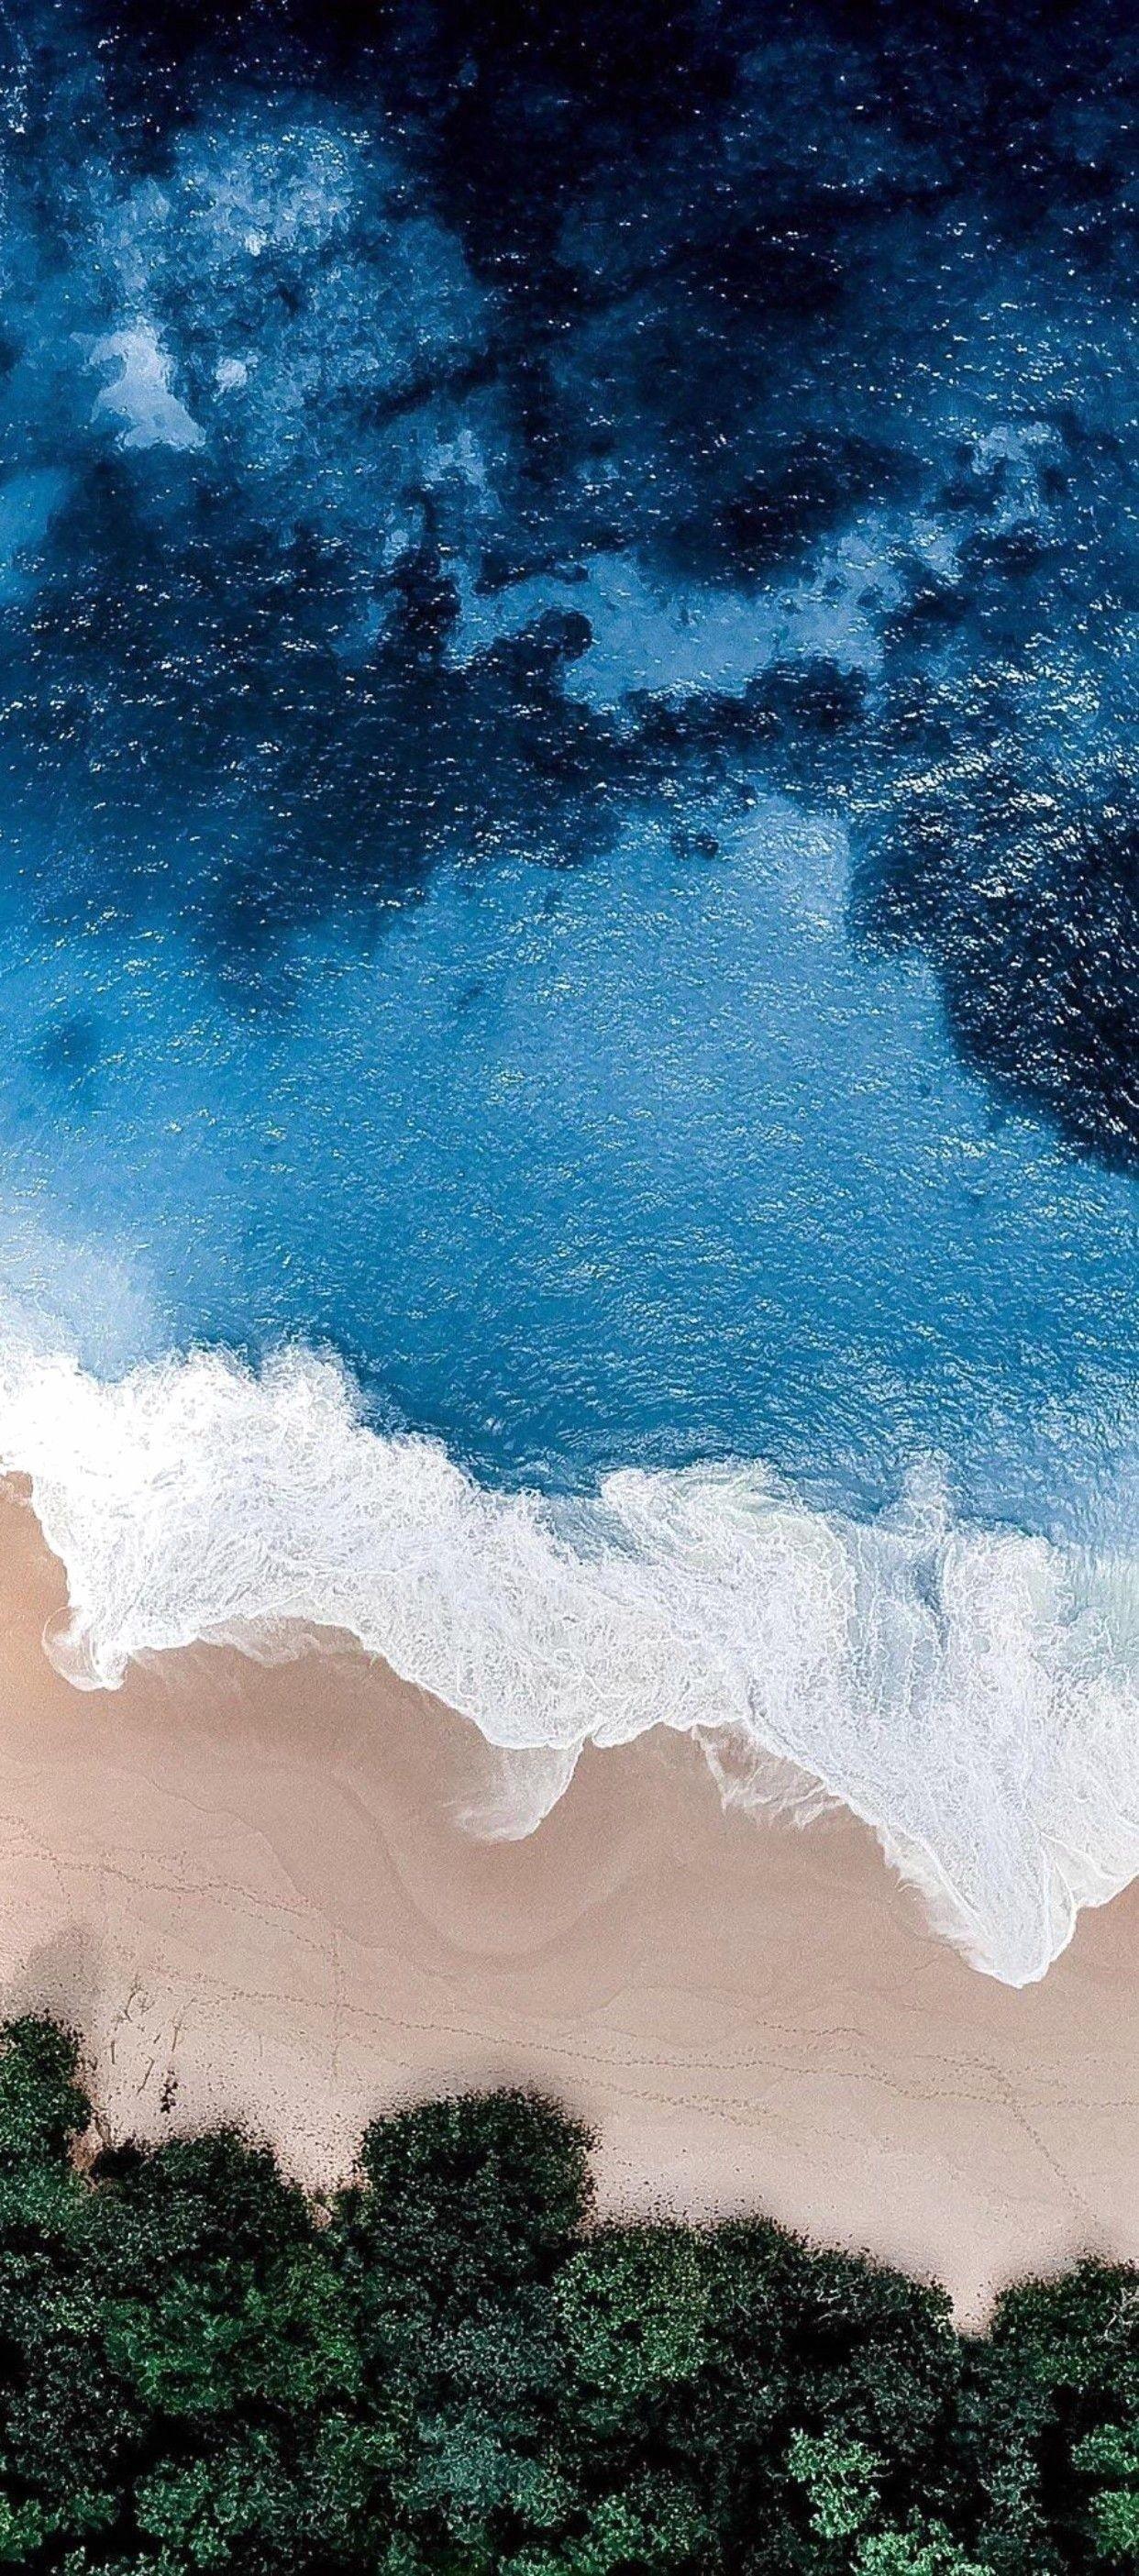 Apple iPhone 11 4k Wallpapers - Wallpaper Cave